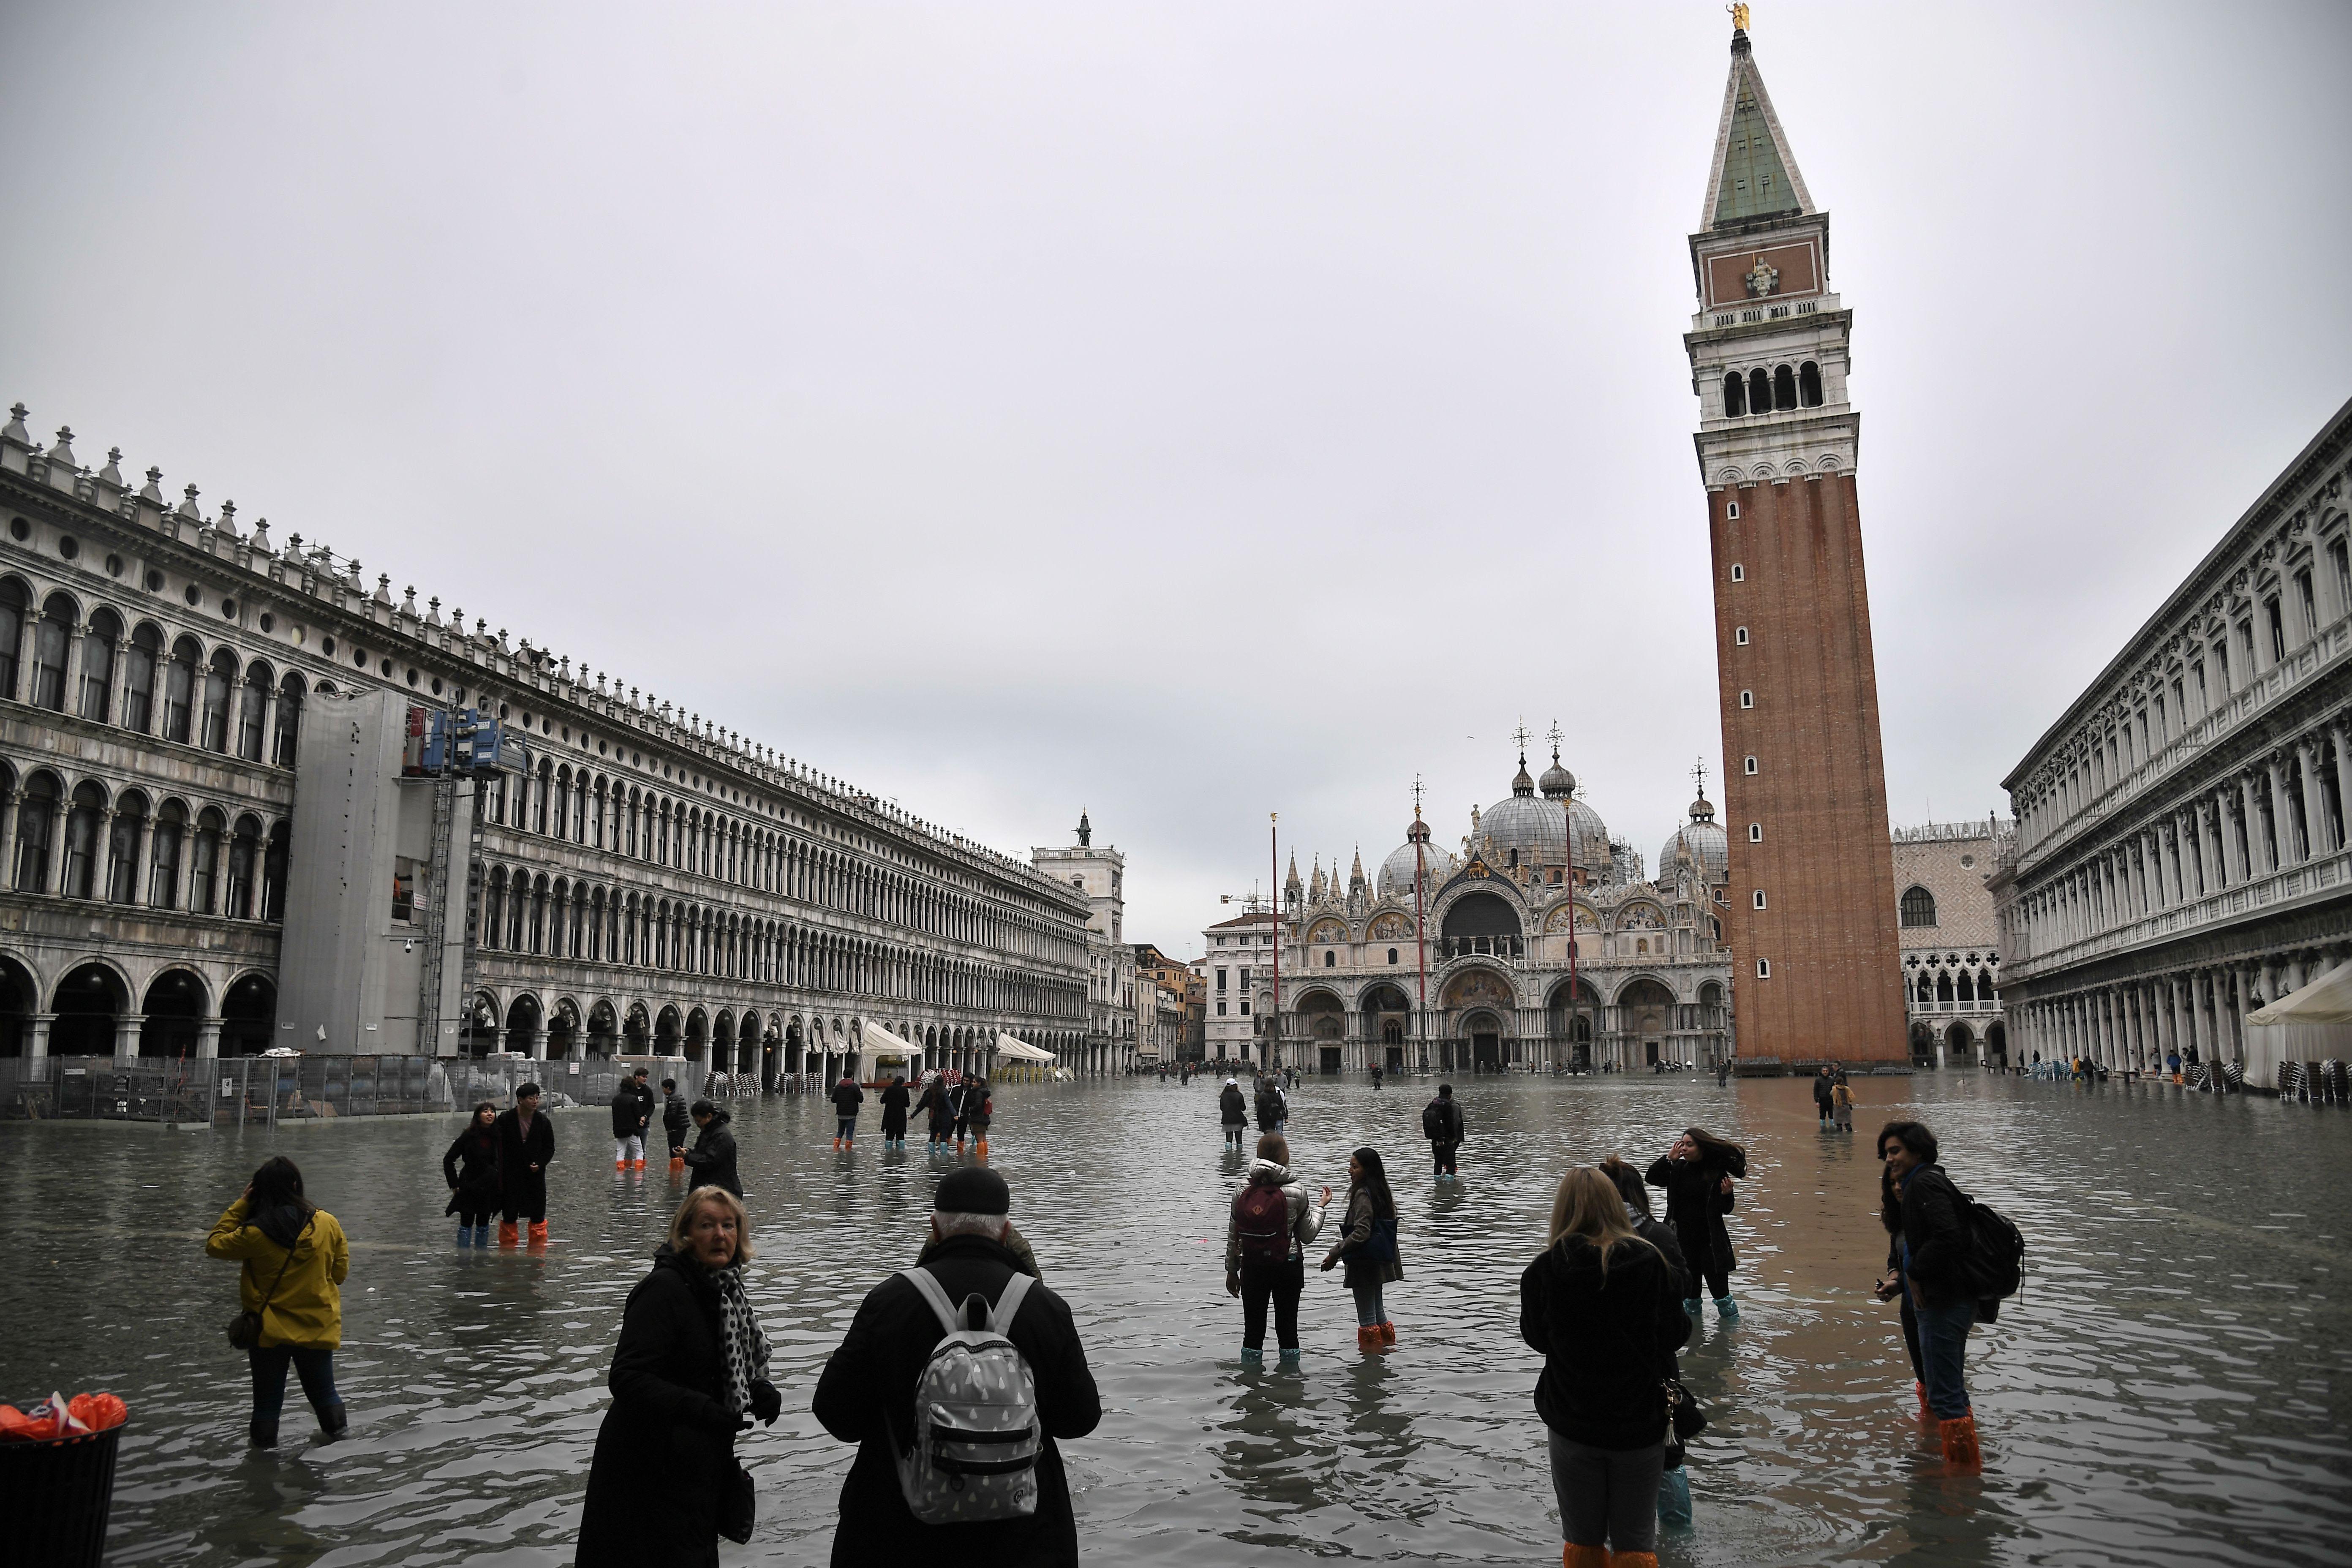 WORLD-NEWS-VENICE-FLOODING-1-GET-2.jpg?time=1594577824